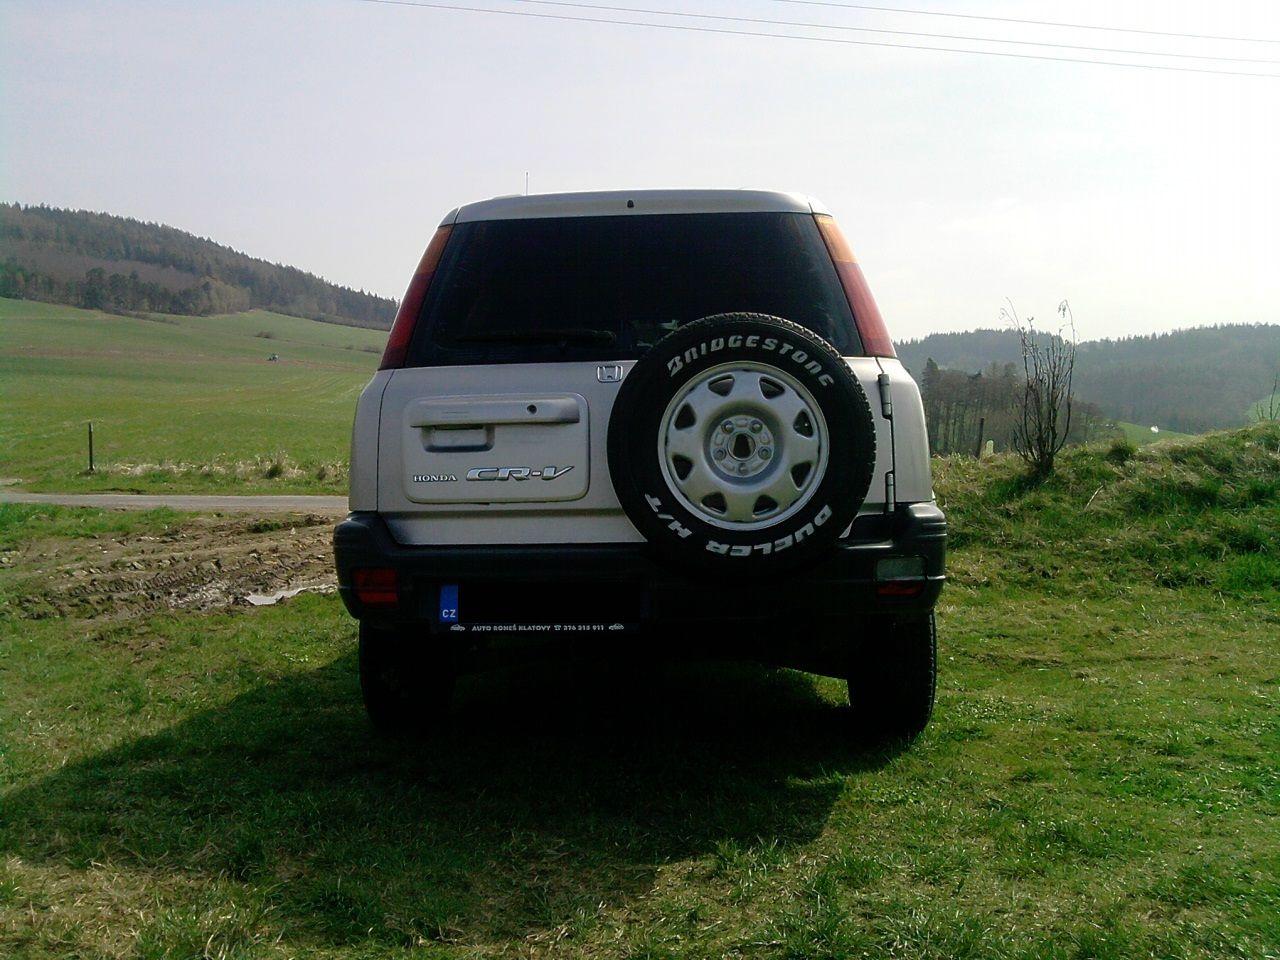 Merveilleux Jeep, Jeeps